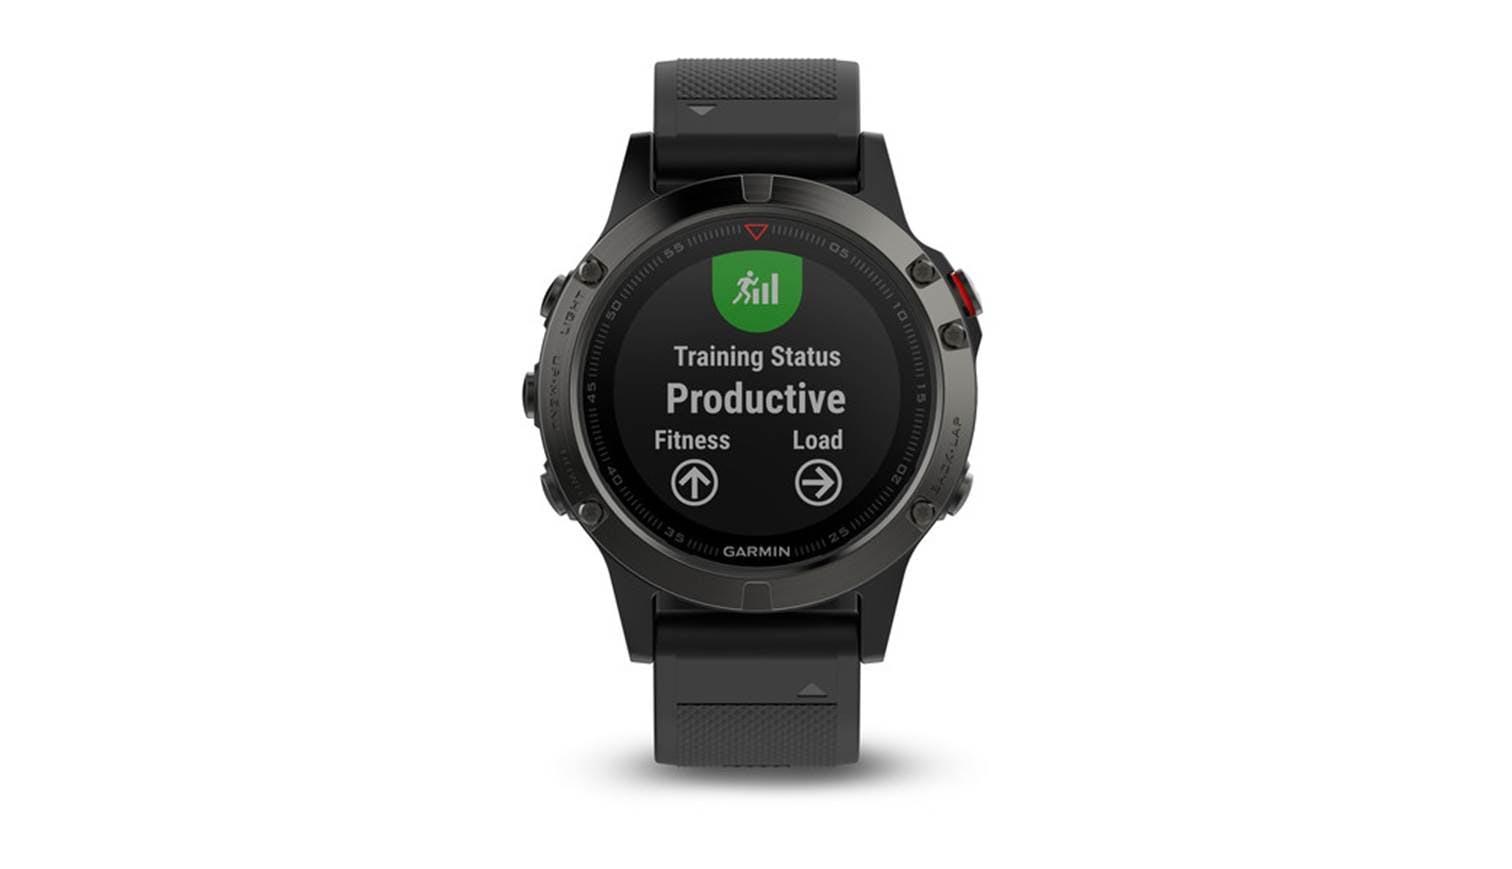 Jual Garmin Fenix 5 Sapphire - Smartwatch Jam Tangan Olahraga Hitam -  TokoTeknik77  a6d592631d